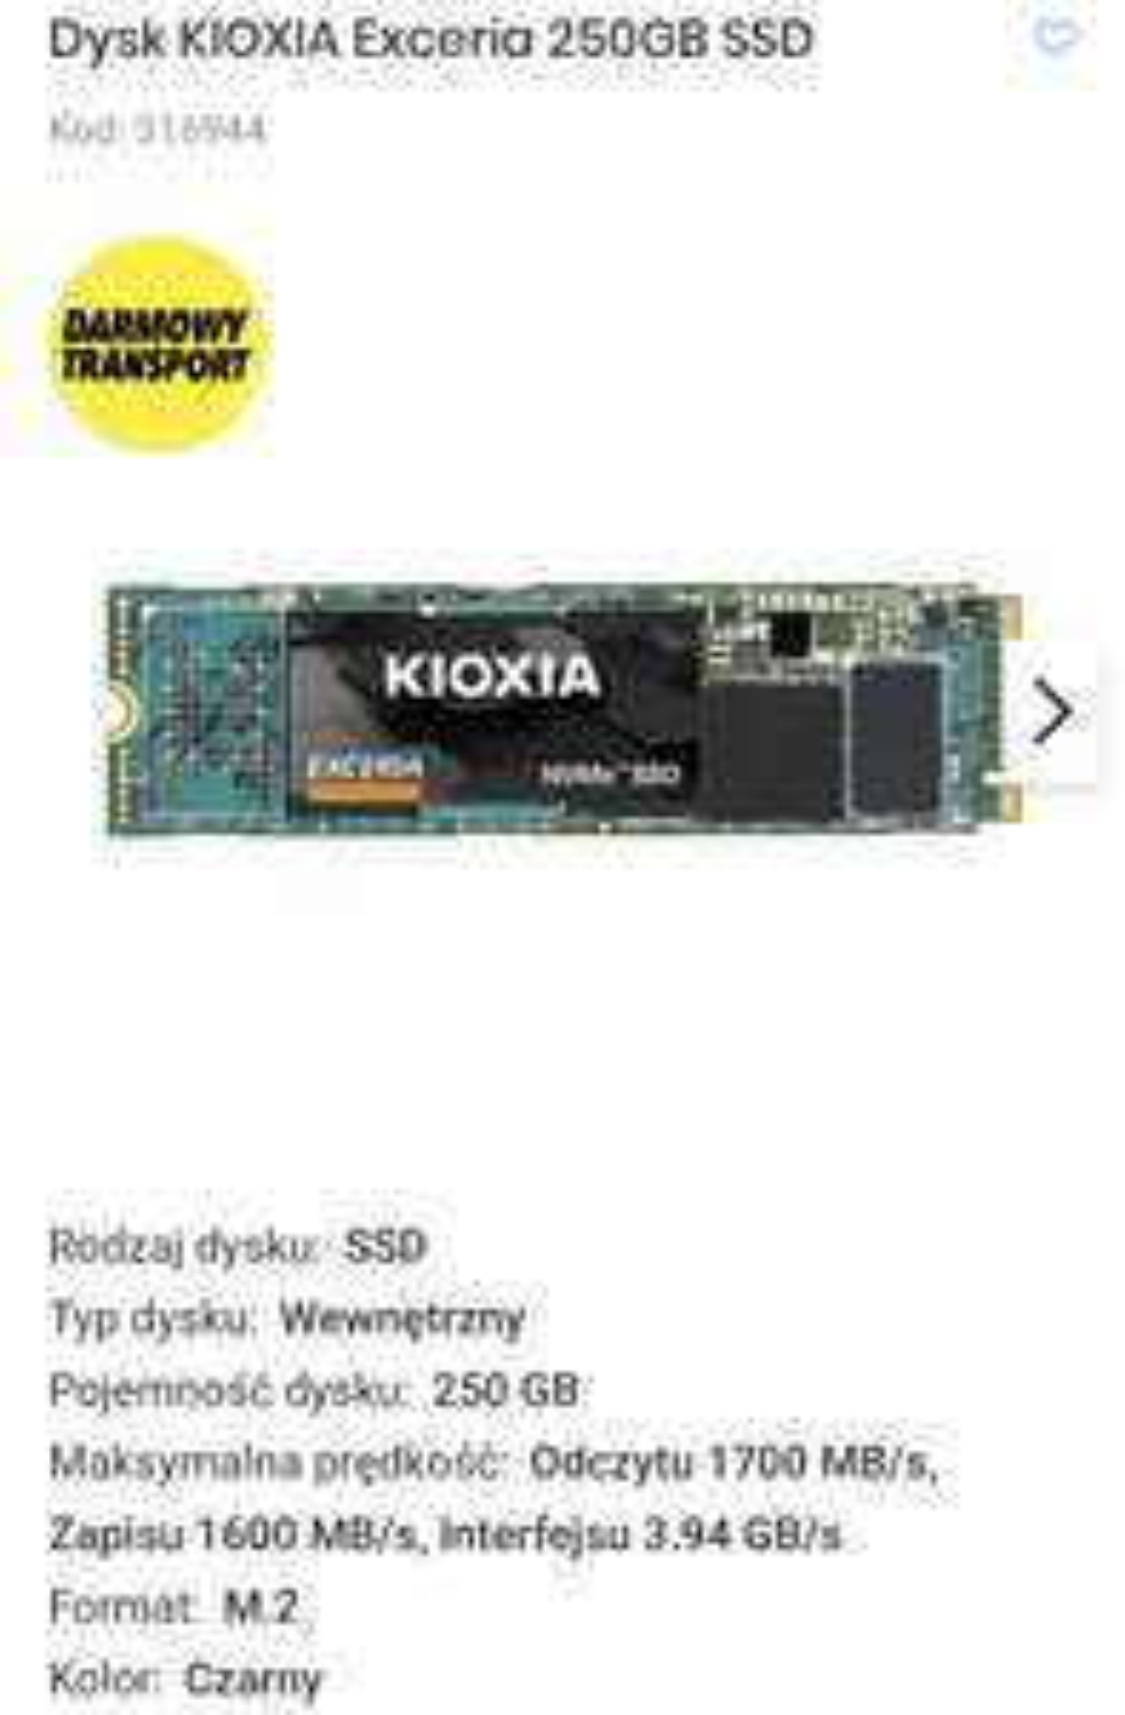 Dysk SSD Kioxia (Toshiba) Exceria NVMe 250GB PCIe 3.0 x3, 1700/1200 MB/s